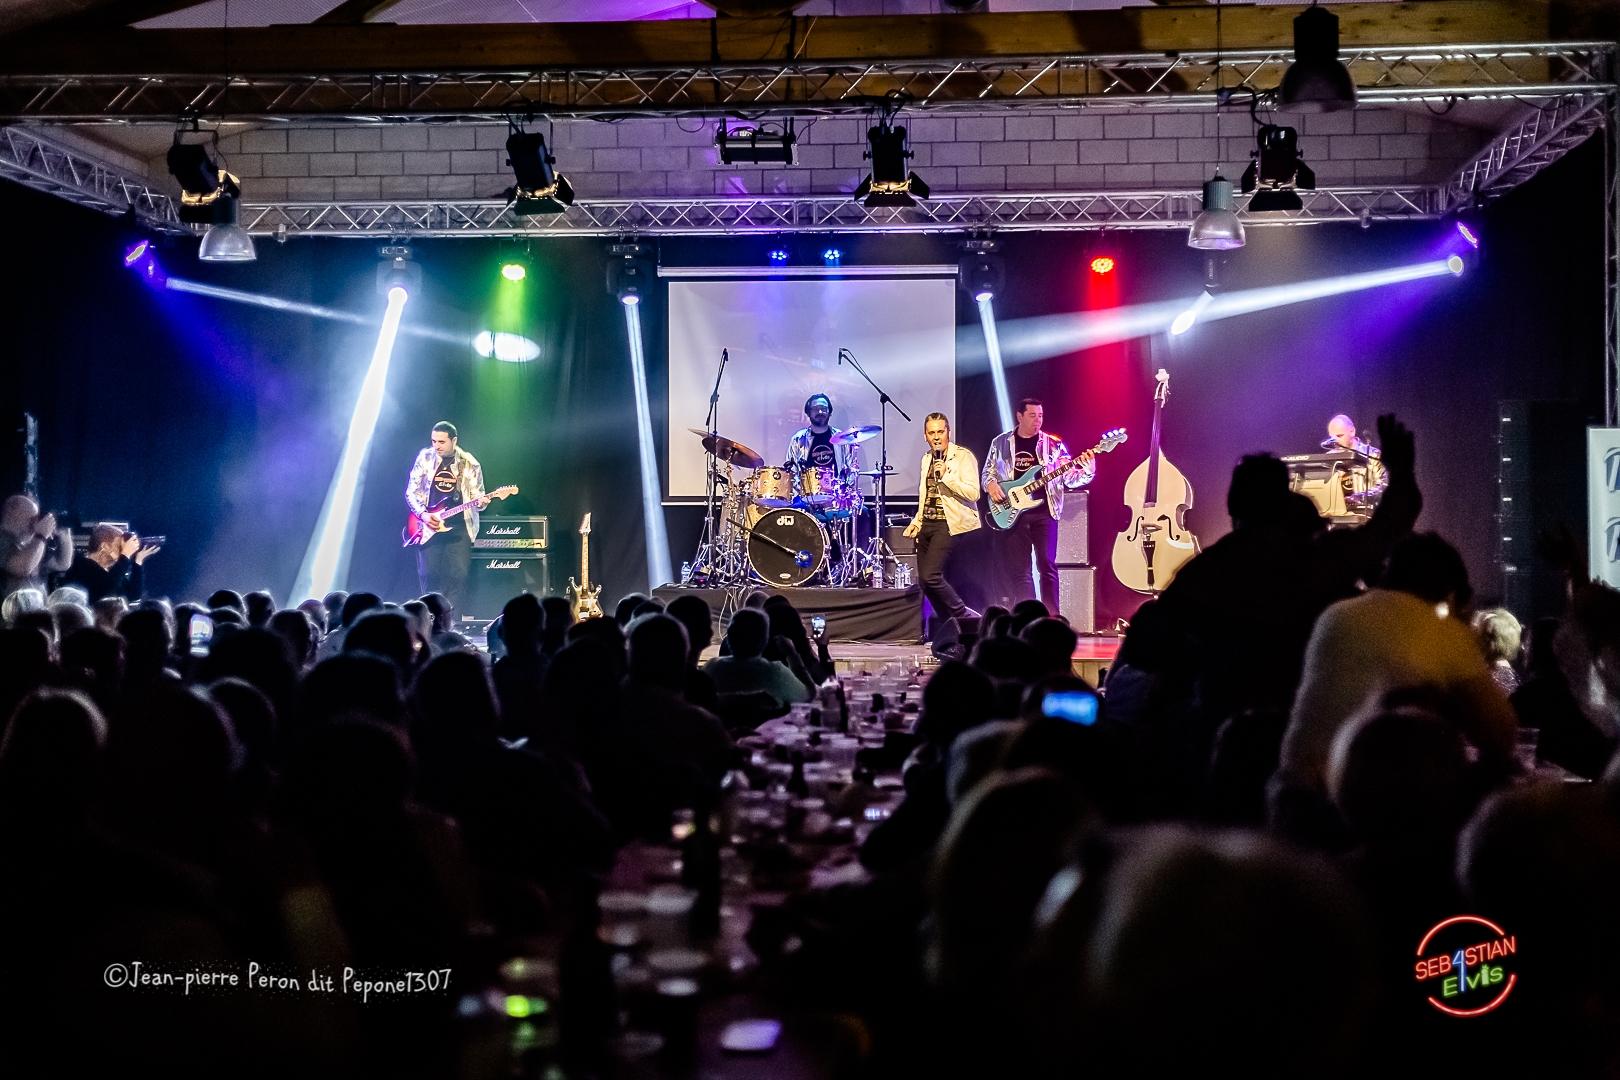 sebastian-for-elvis-pepone1307-centre-culturel-rocourt-facebook-28